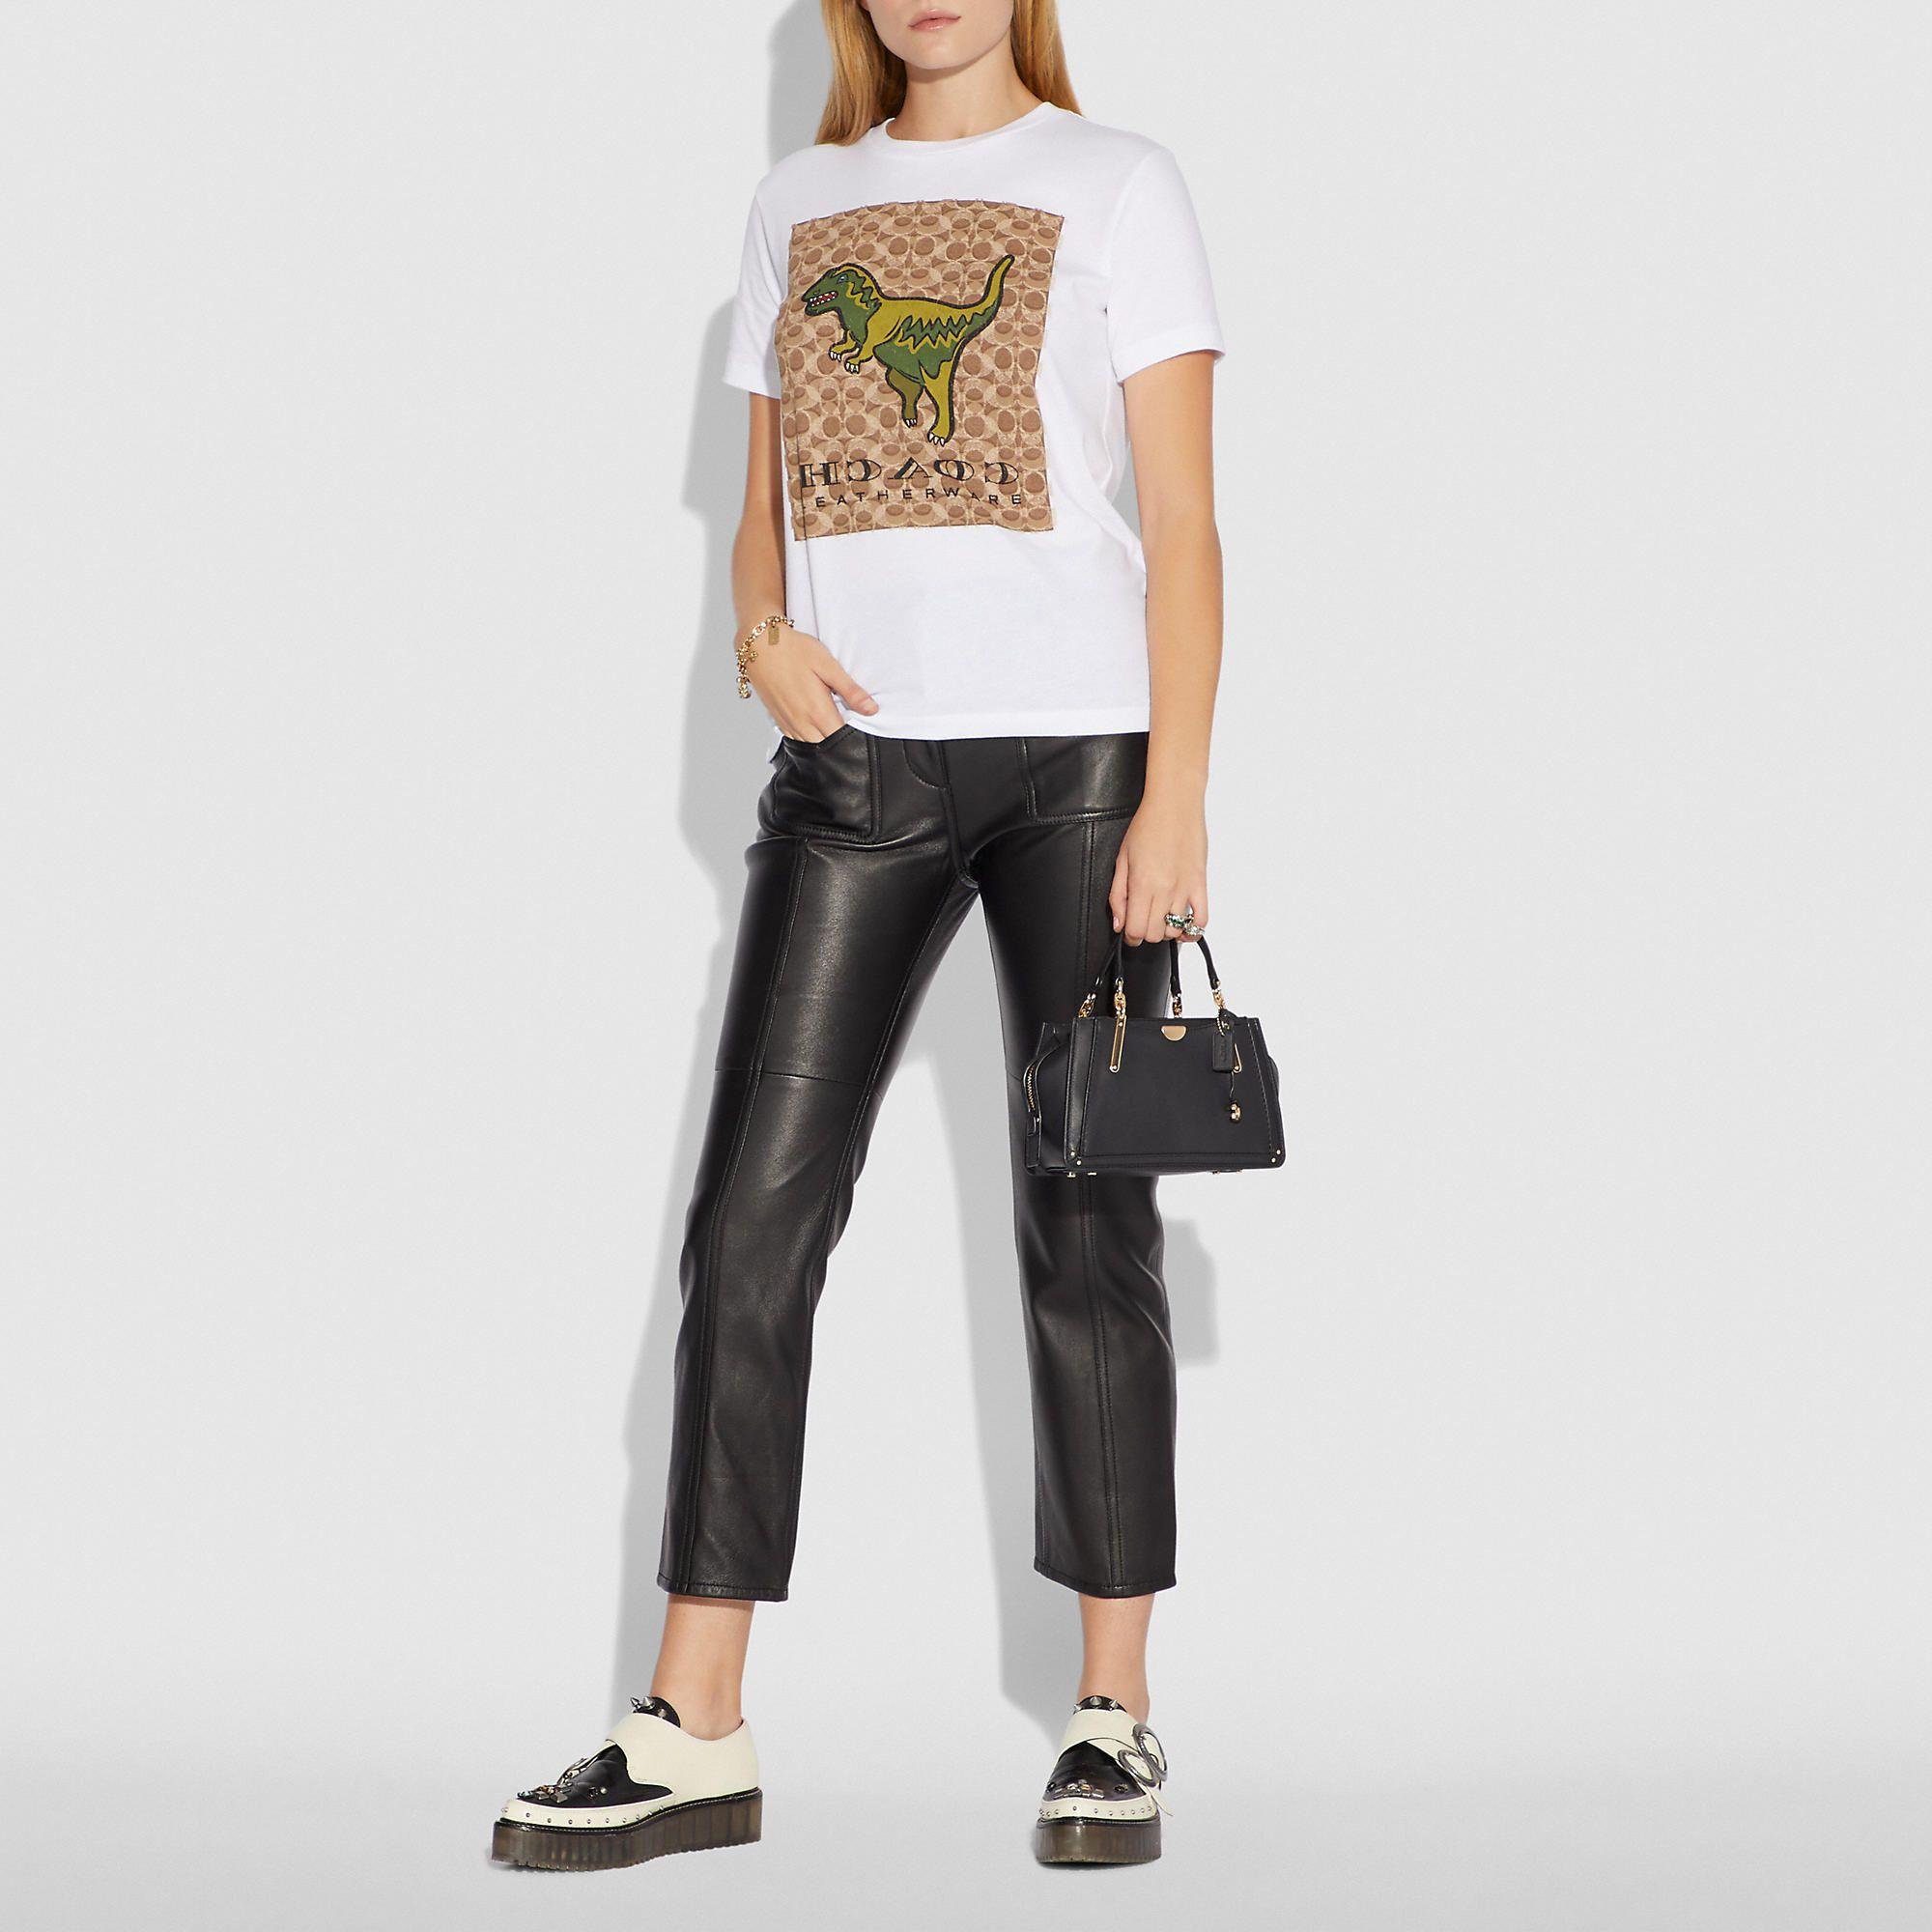 9bedd7e349 COACH Dreamer 21 - Women's Designer Crossbody in 2019 | Products ...